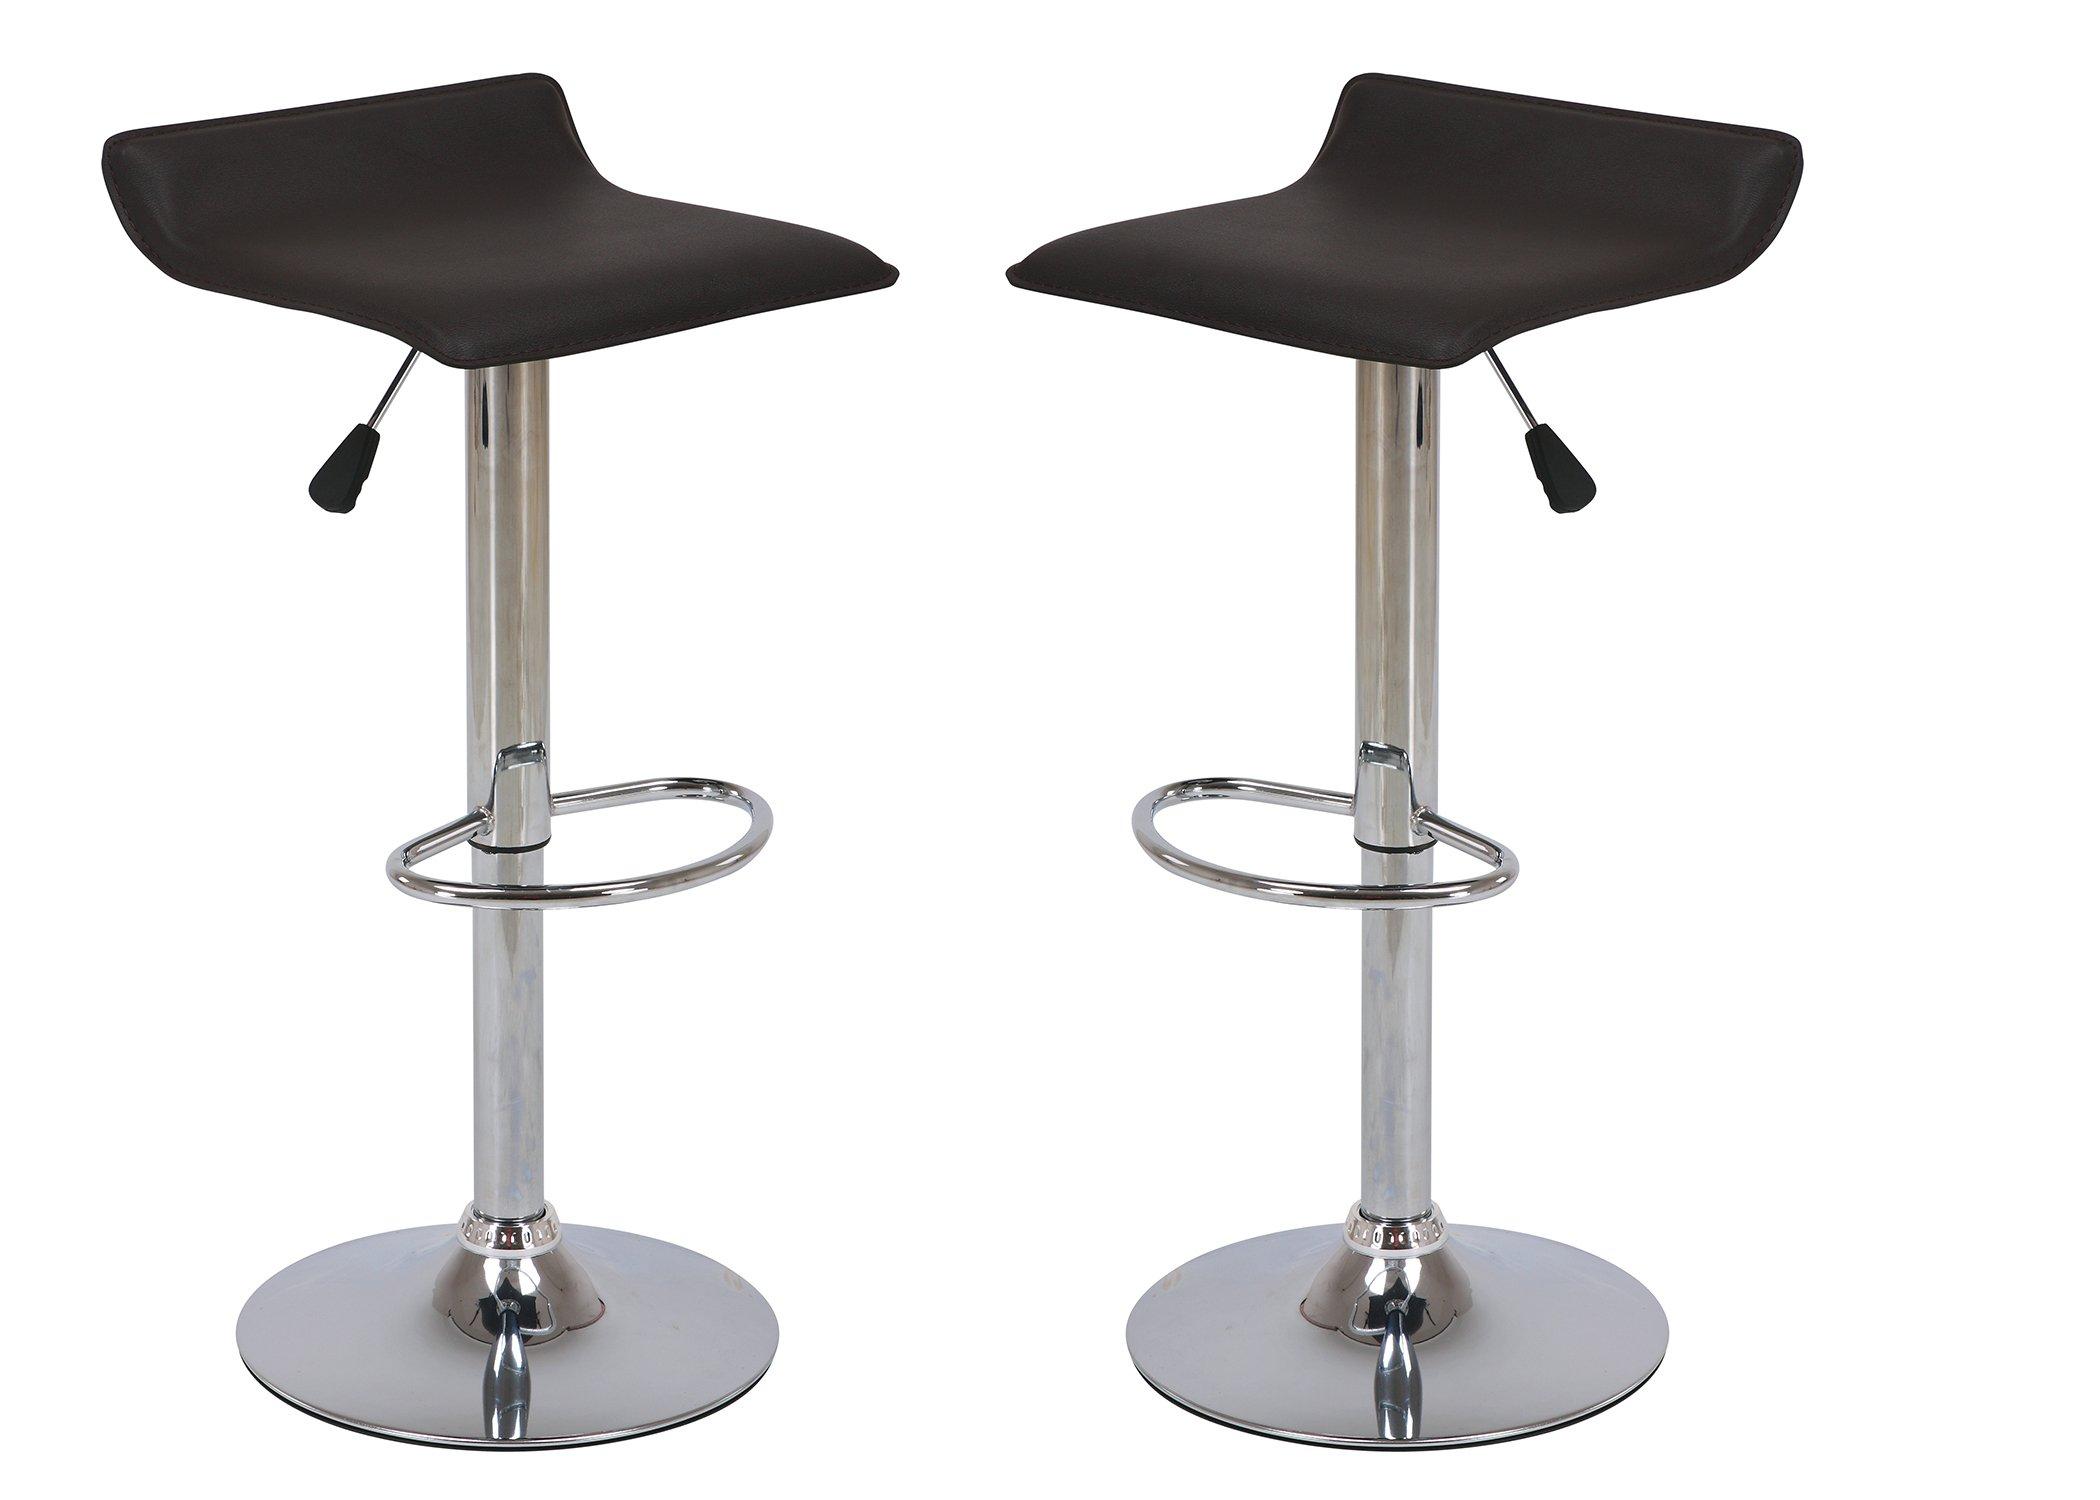 Vogue Furniture Direct Adjustable Height Swivel Barstools with Footrest, Black (Set of 2) VF1581044-2